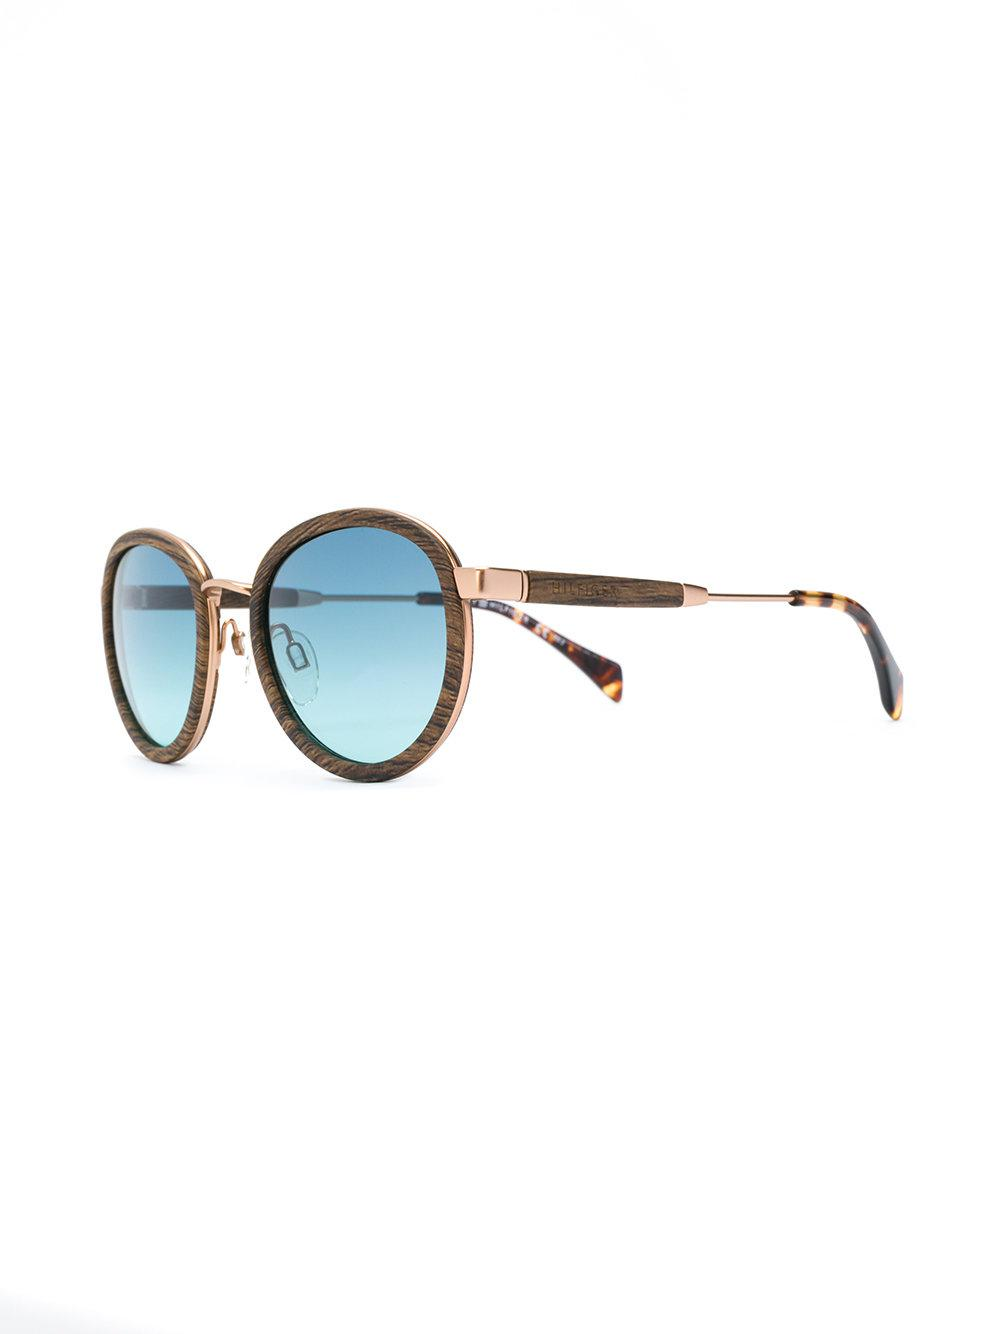 93b32f9753 Gafas Tommy Lyst marrón Hilfiger de sol madera efecto en qwvTXqrn1